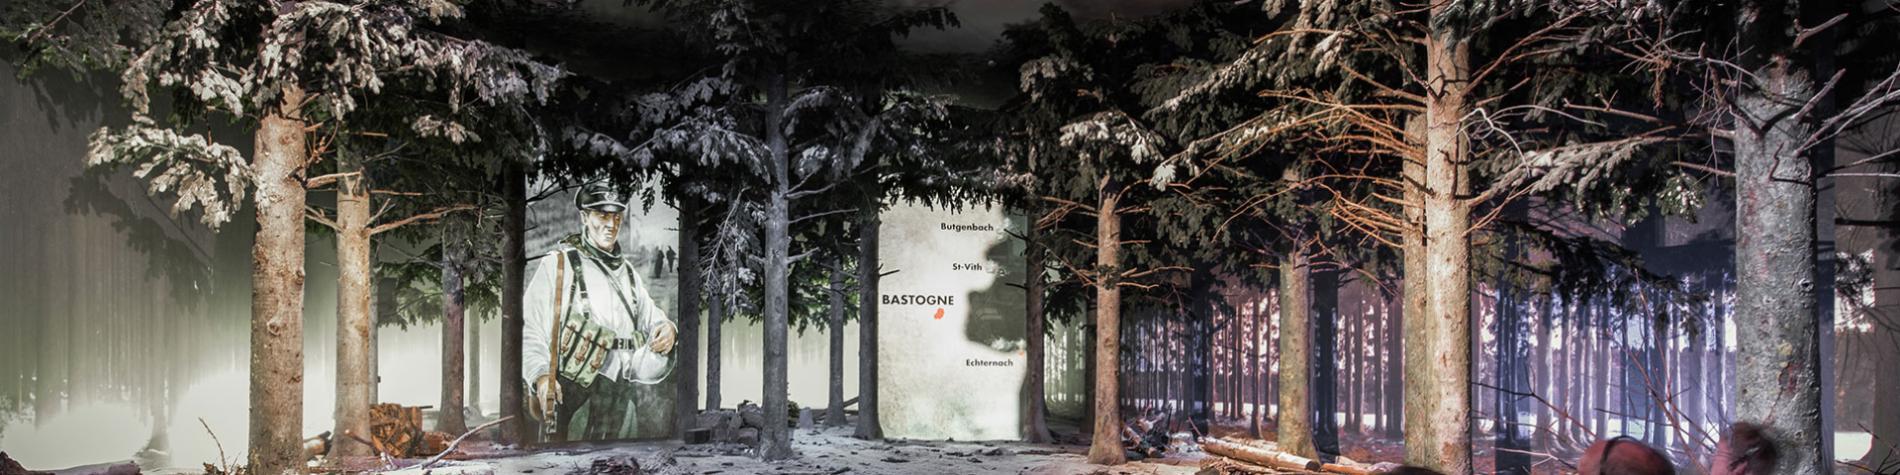 Bastogne - War - Museum